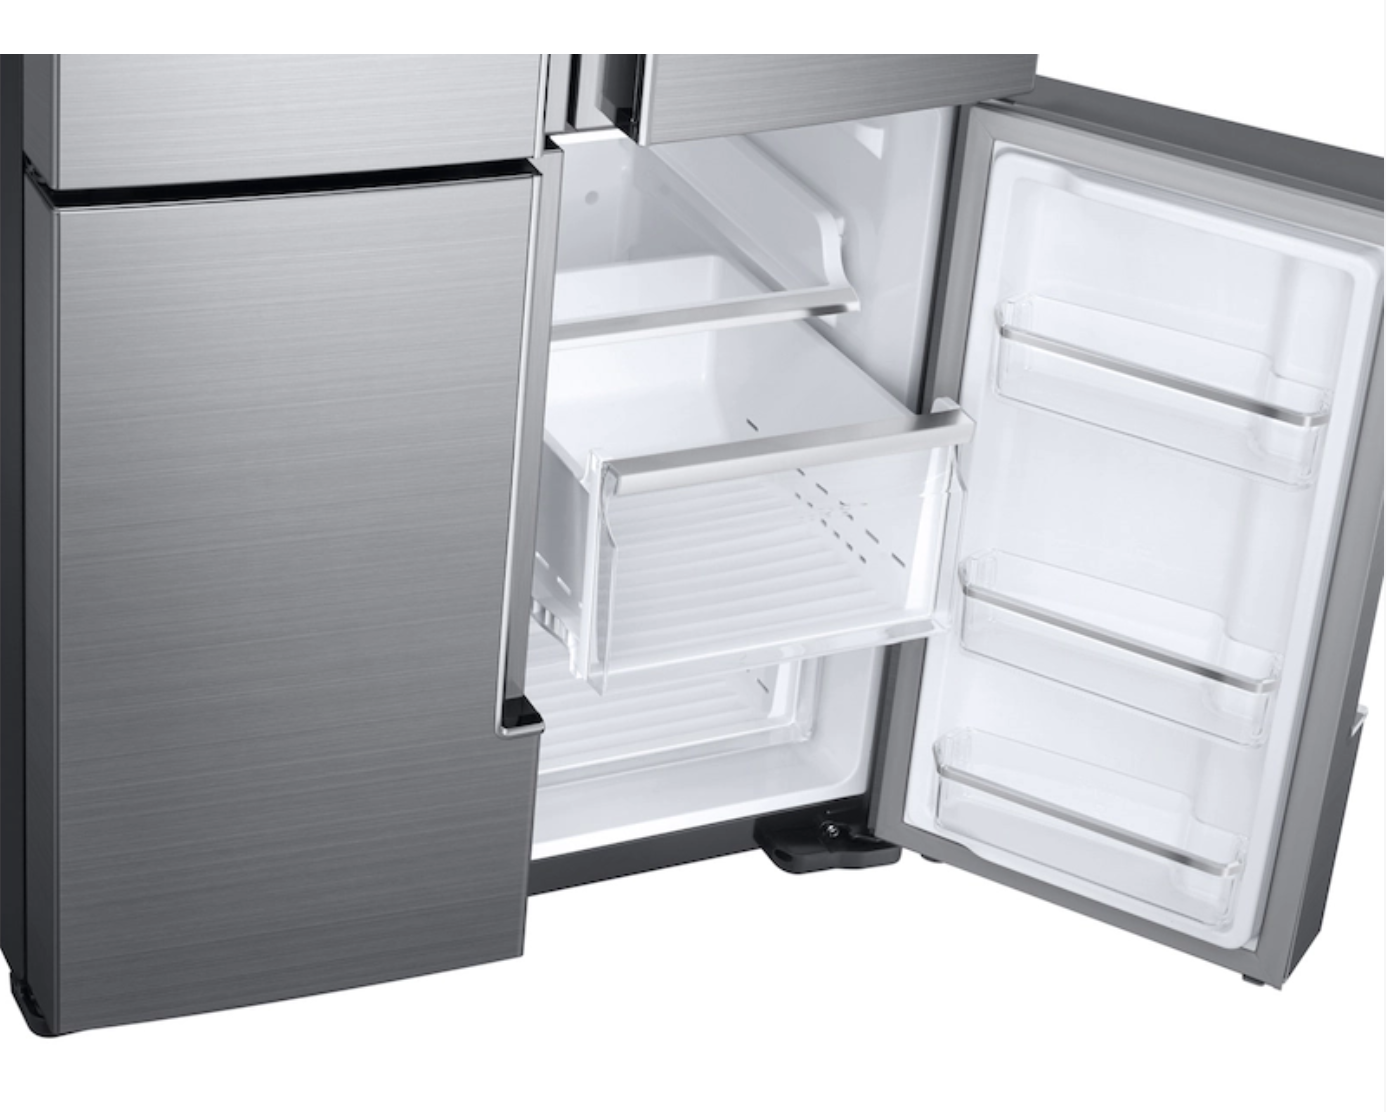 Samsung's 28 cu. ft. 4-door flex fridgerator  has flexzone capabilites as well as adjustable shelves, triple cooling, and a fingerprint resistant finish.